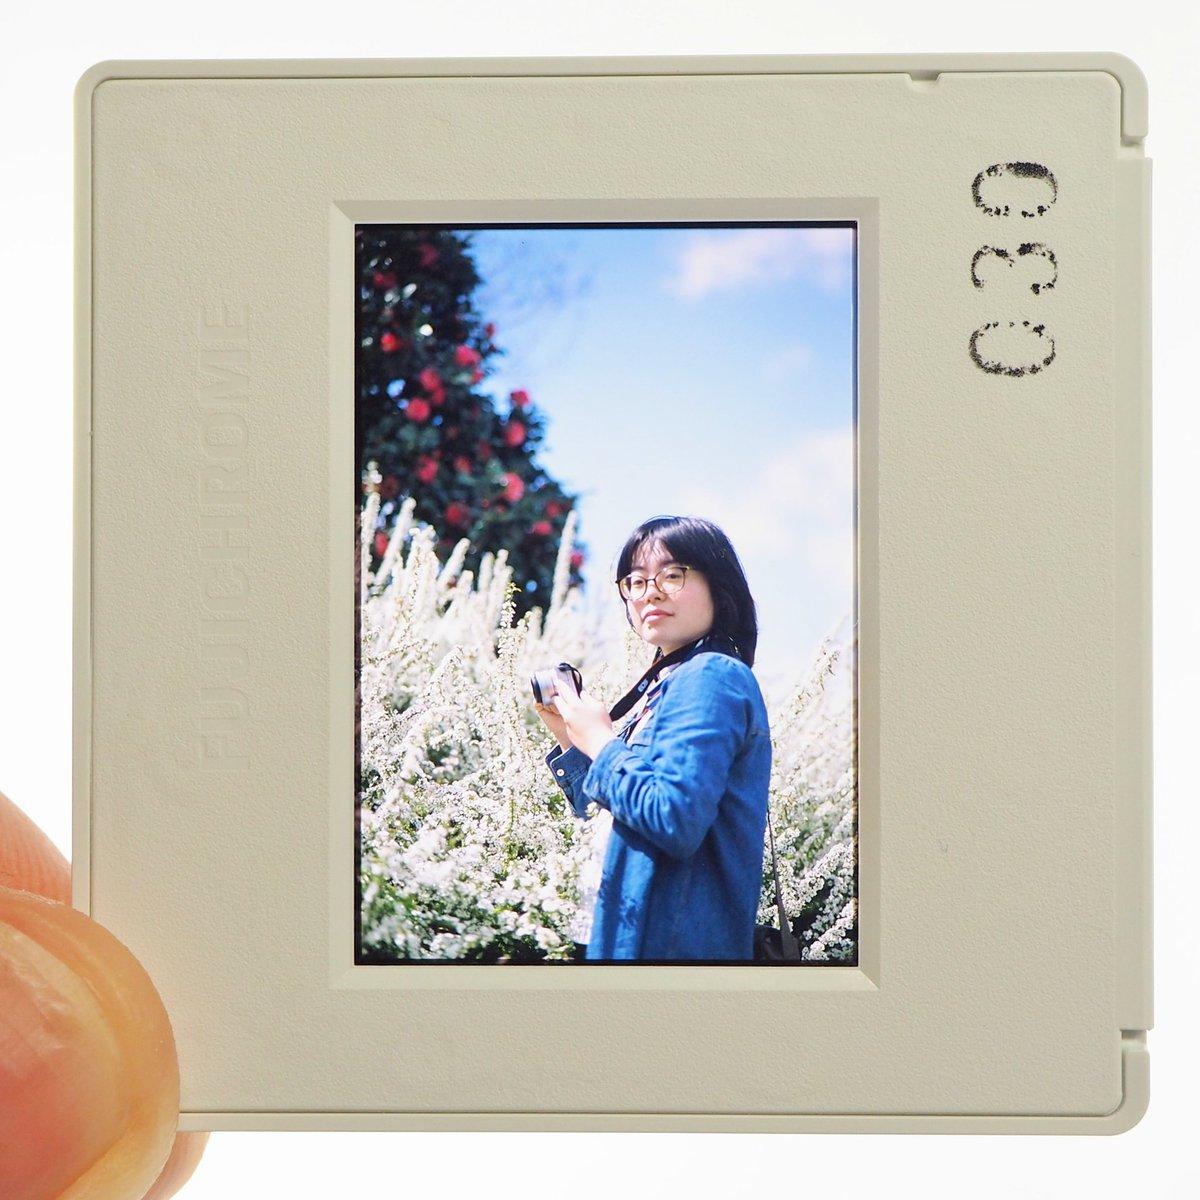 [I, portraited]  :Nikon FA, FUJIFILM PROVIA100F #いちにちいちまい #ファインダー越しの私の世界 pic.twitter.com/voPqTUAYC9